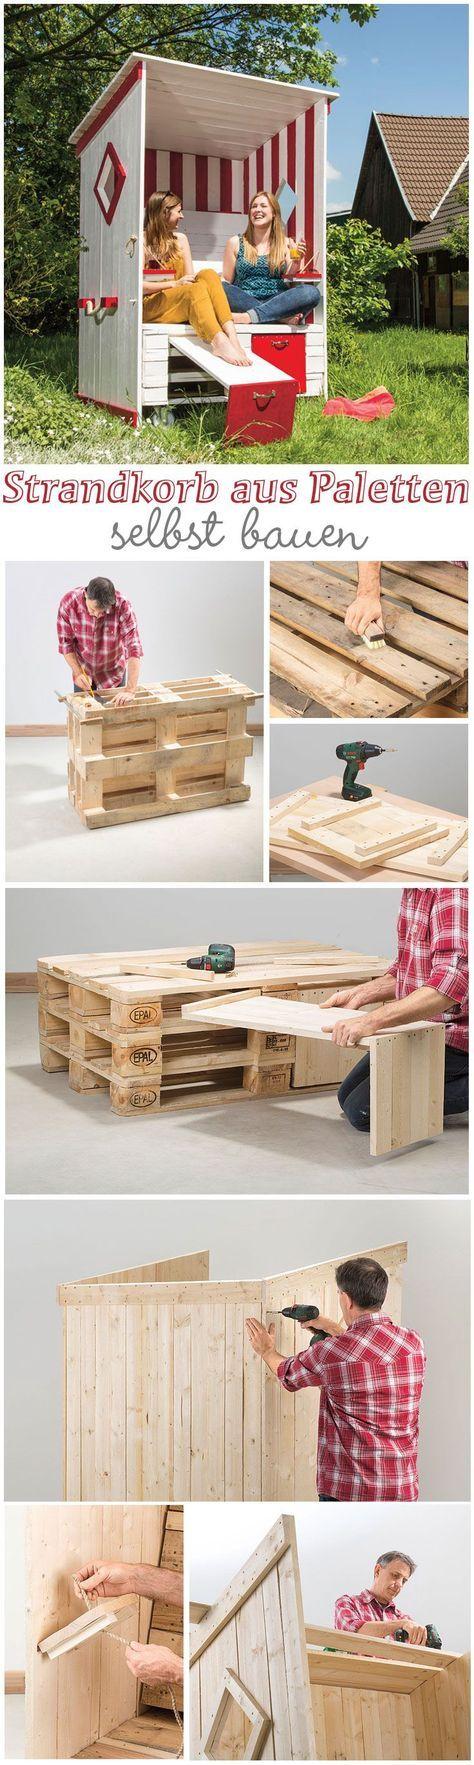 strandkorb aus paletten pinterest manualidades de carton proyectos de casa y palets. Black Bedroom Furniture Sets. Home Design Ideas